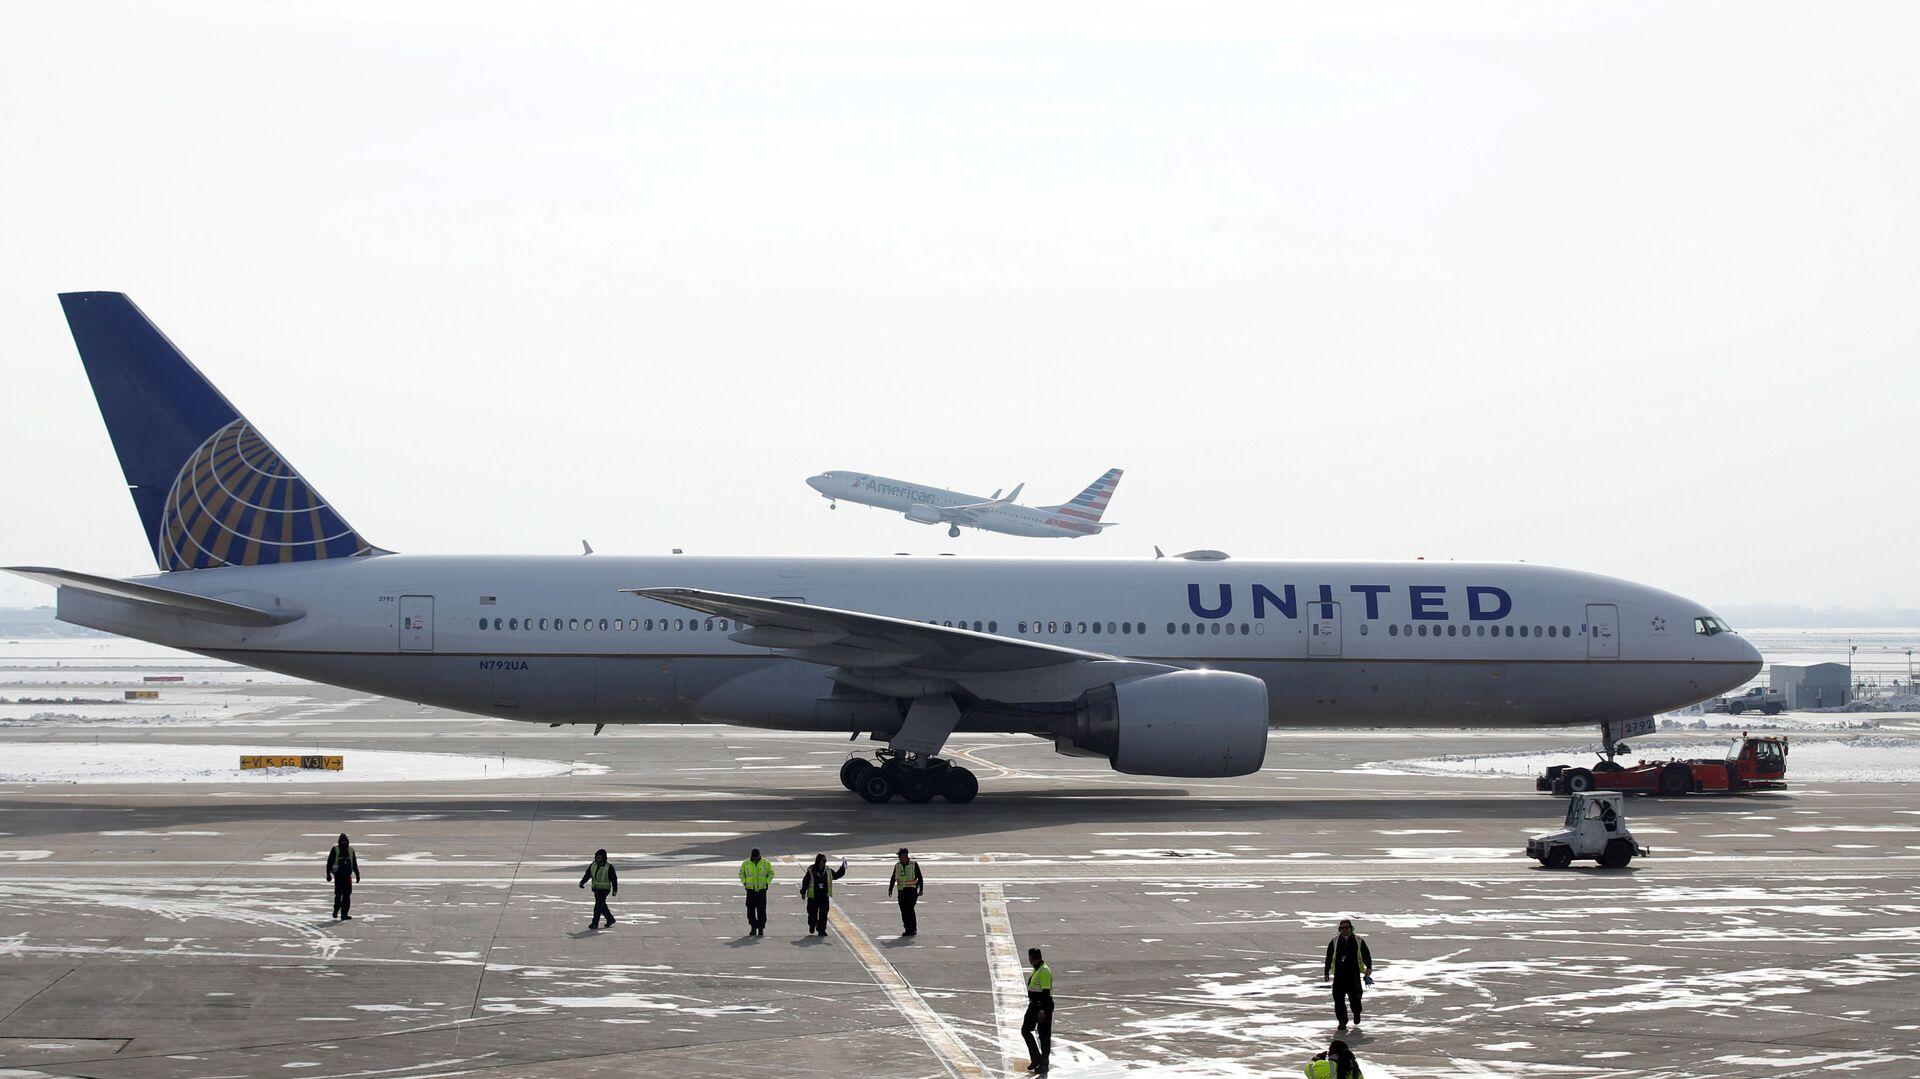 A United Airlines Boeing 777-200ER  plane is towed as an American Airlines Boeing 737 plane departs from O'Hare International Airport in Chicago, Illinois, U.S. Nov. 30, 2018.  - Sputnik International, 1920, 21.09.2021